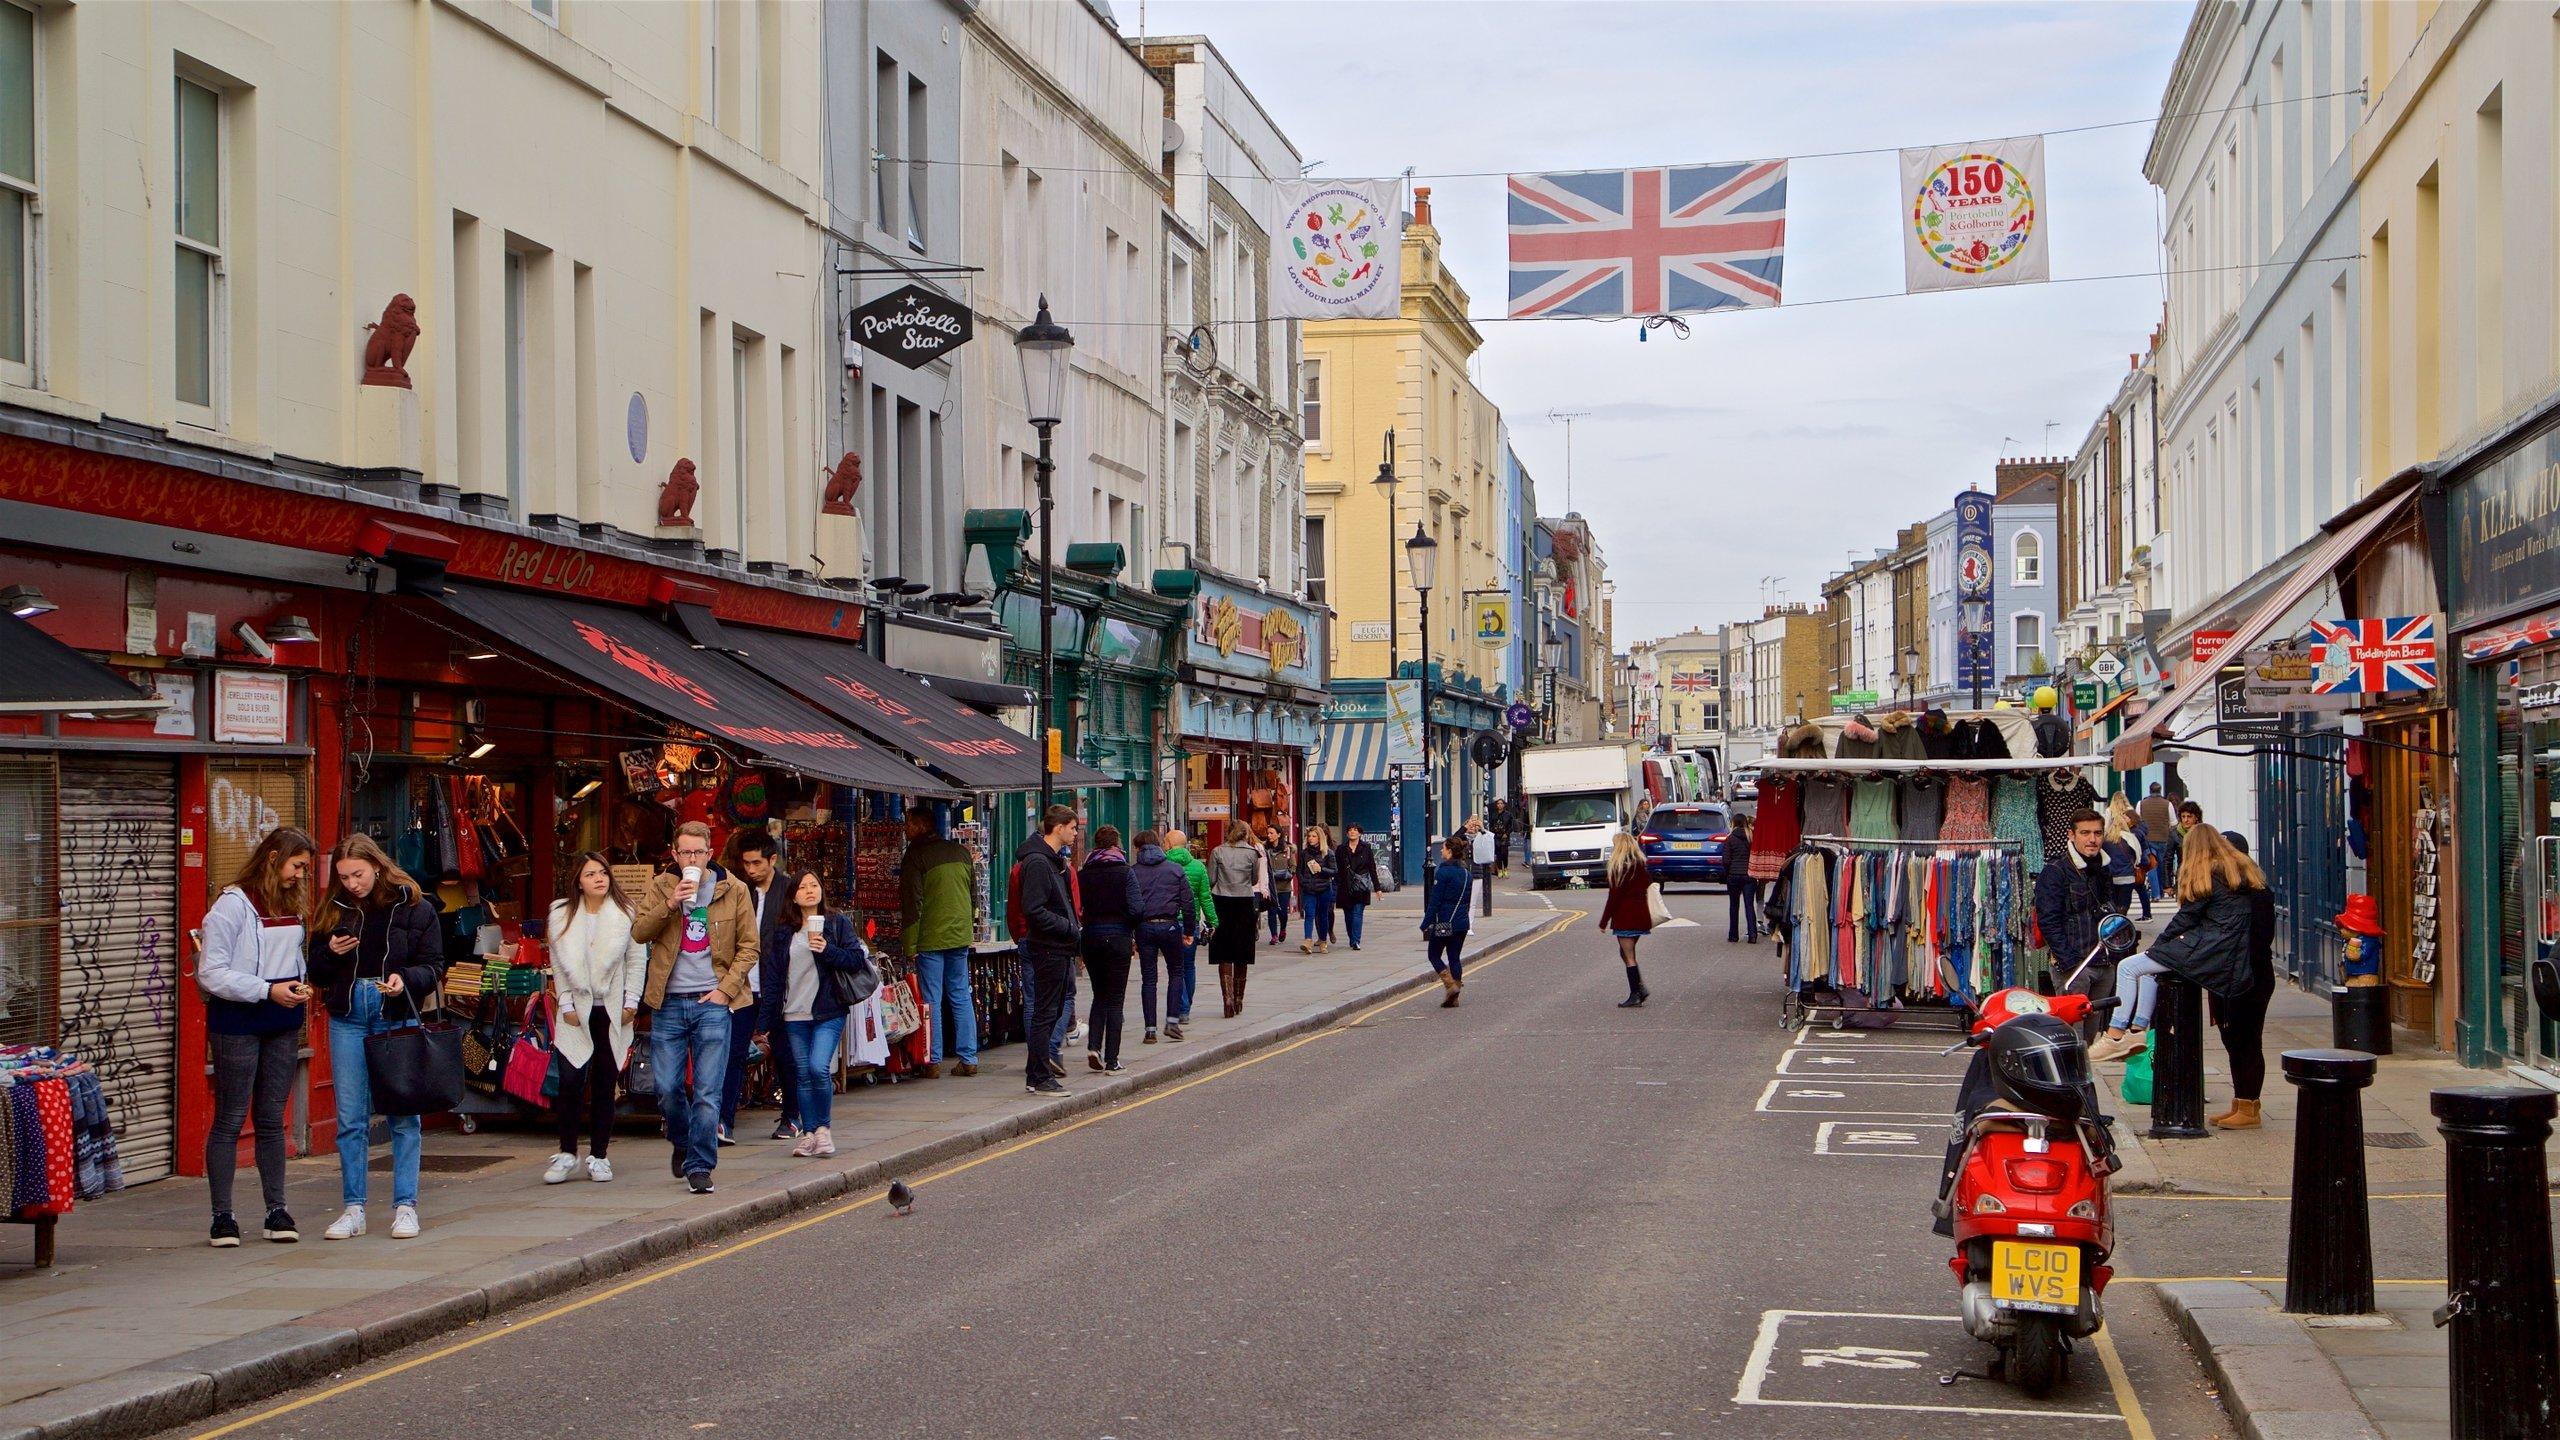 Portobello Road Market, London, England, United Kingdom